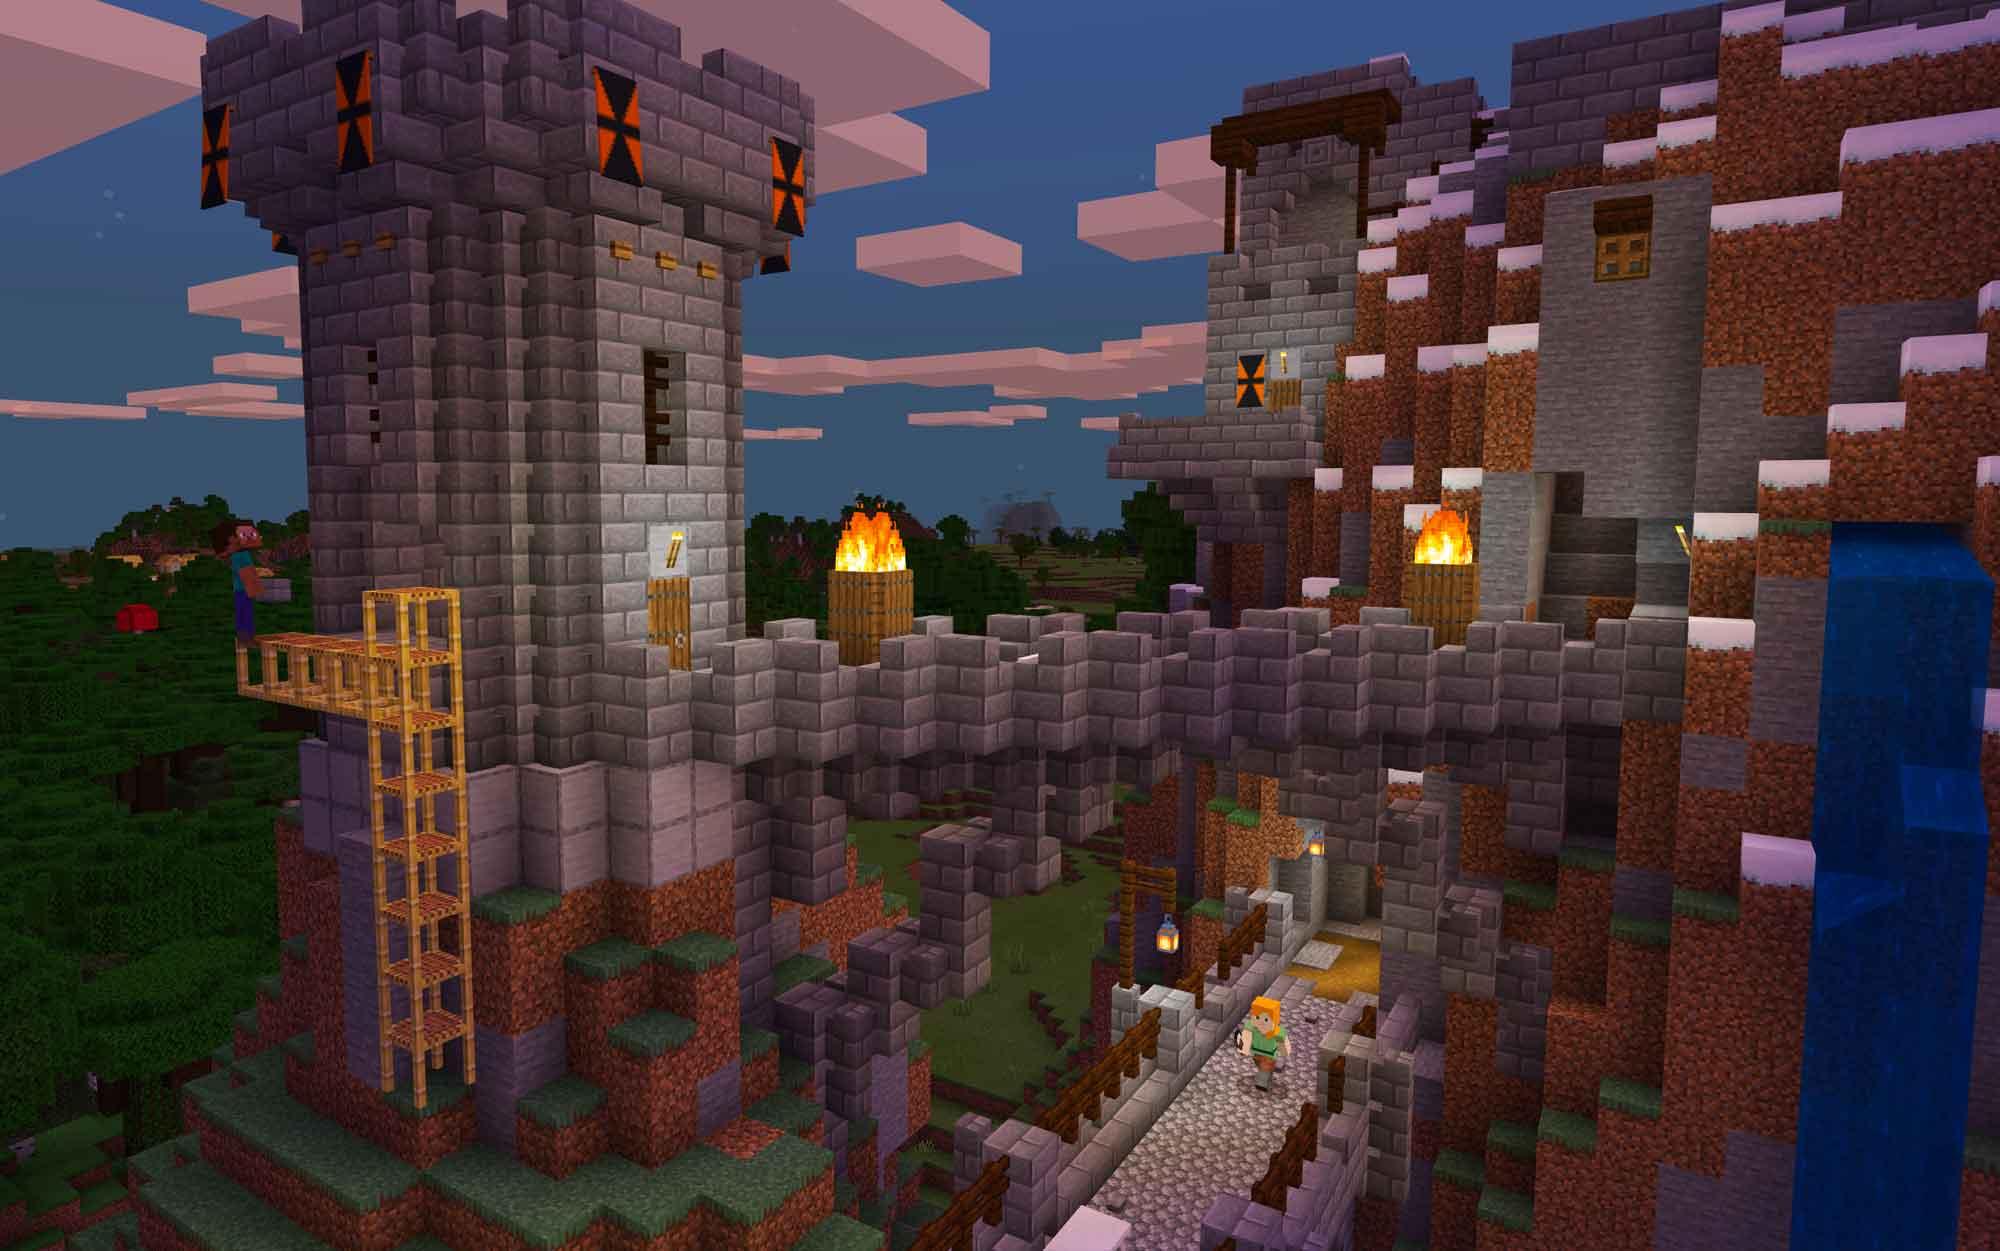 Explore mundos infinitos e construa desde simples casas a grandiosos castelos